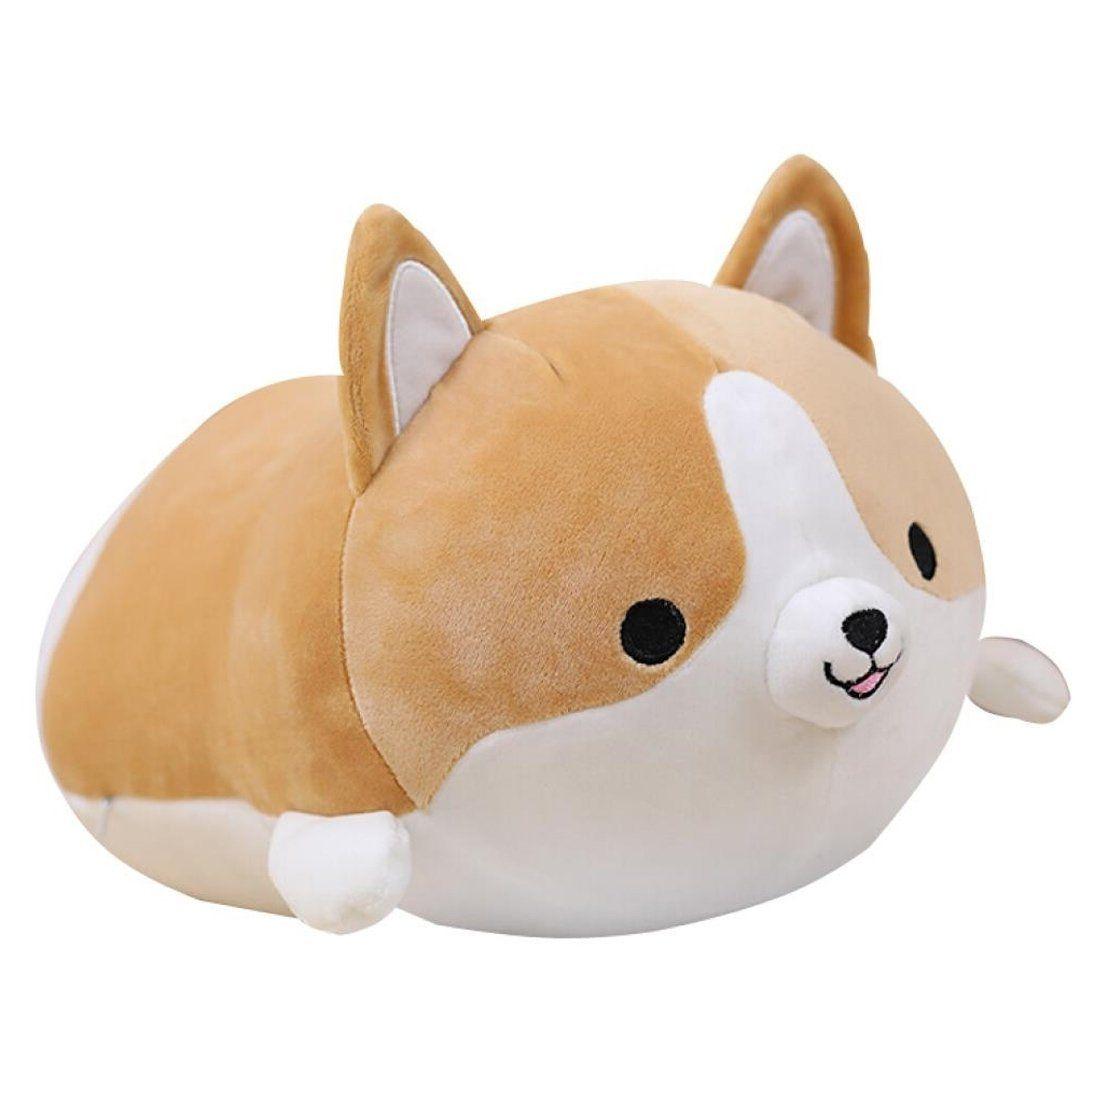 Levenkeness Corgi Dog Plush Pillow Soft Cute Shiba Inu Akita Stuffed Animals Toy Gifts Brown 11 8 In Corgi Dog Pet Toys Corgi Stuffed Animal